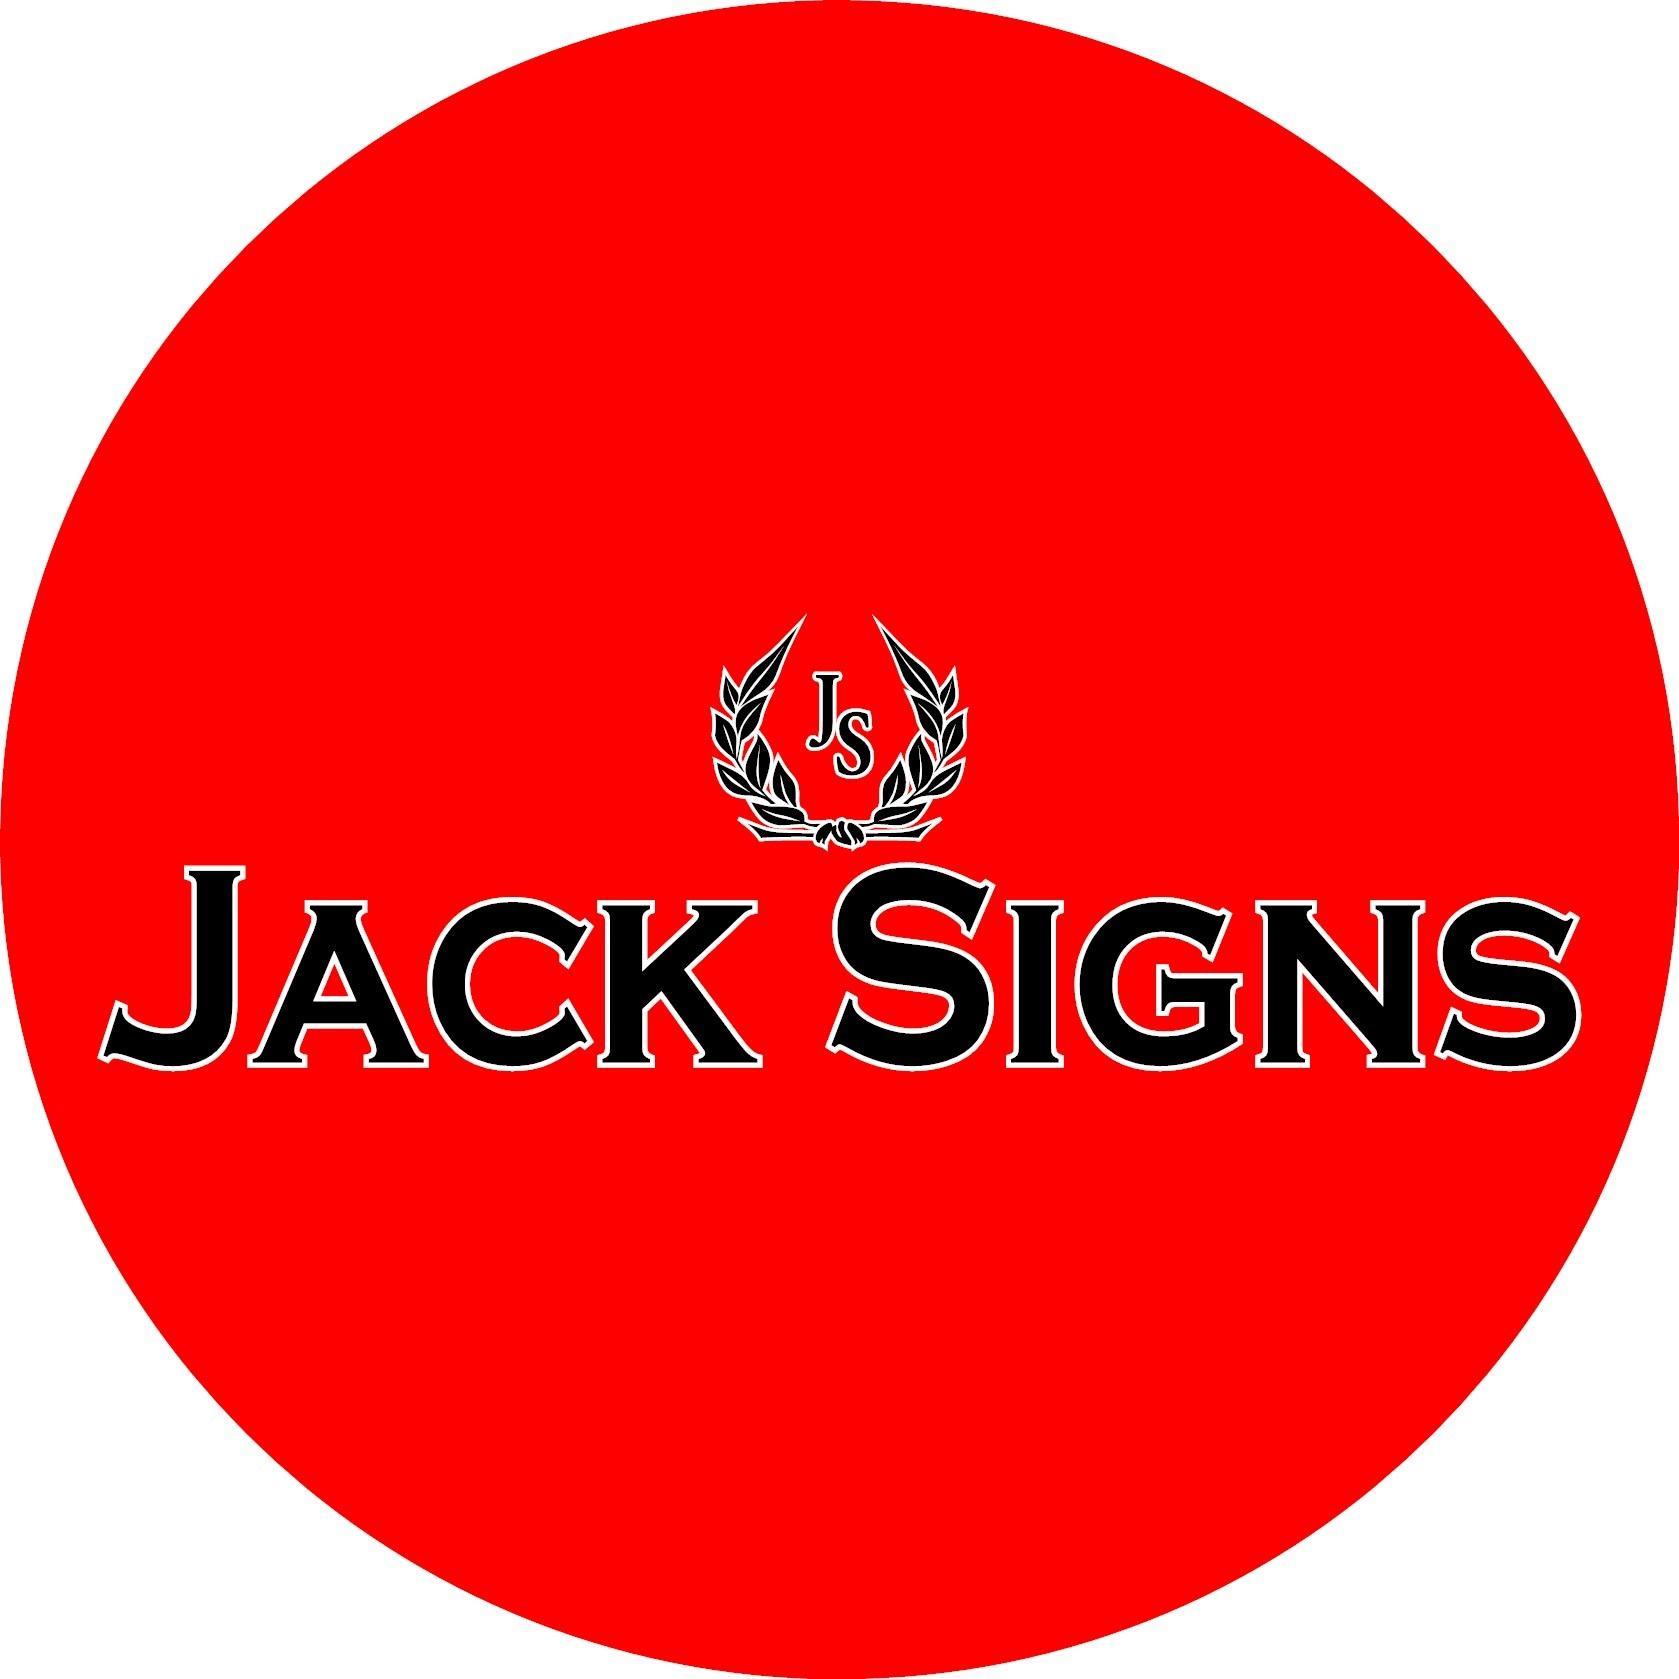 Jack Signs